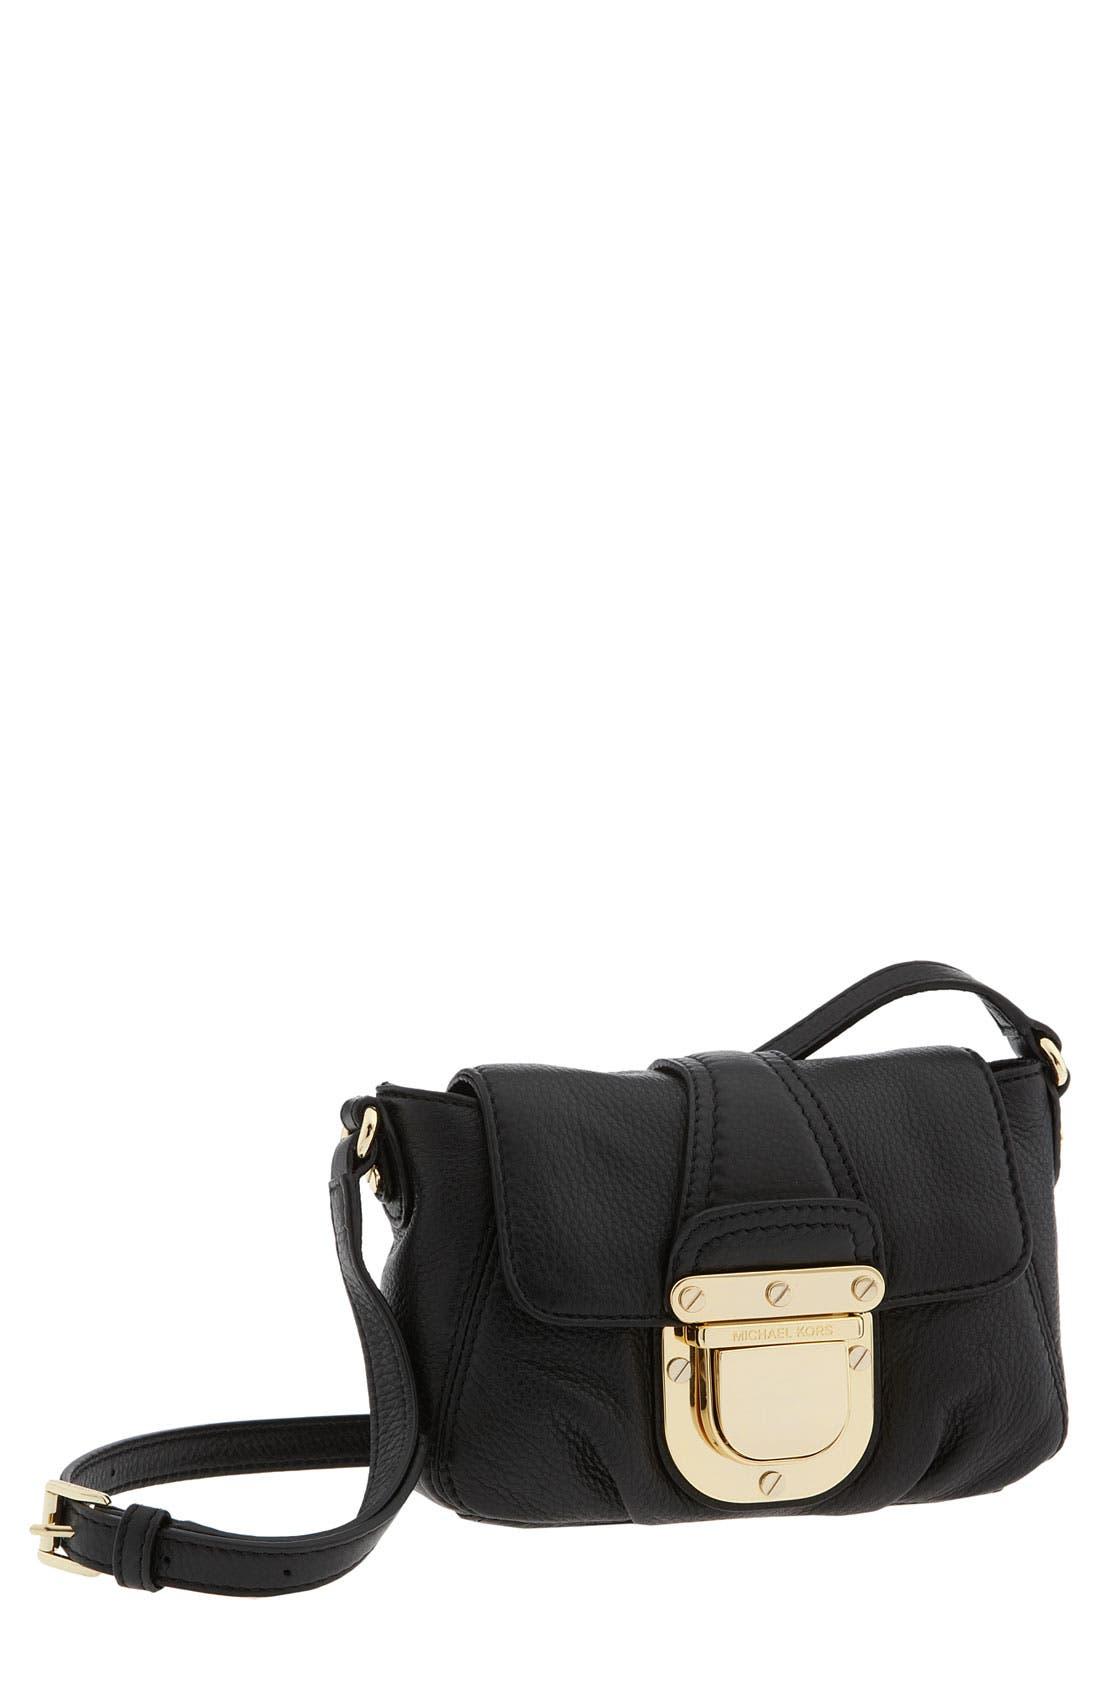 Main Image - MICHAEL Michael Kors 'Charlton' Crossbody Bag, Small